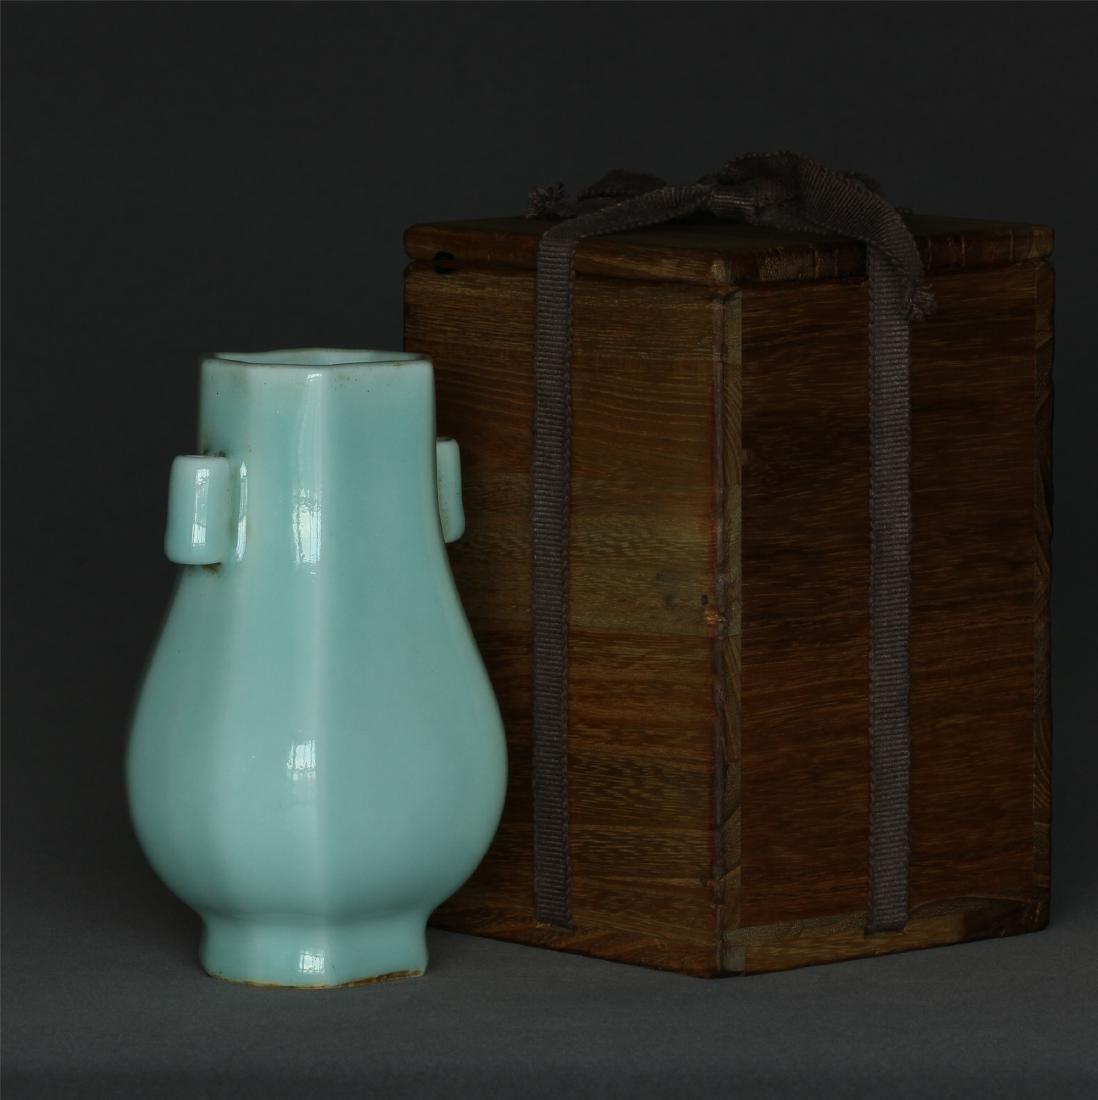 Blue glaze porcelain vase of Qing Dynasty QianLong